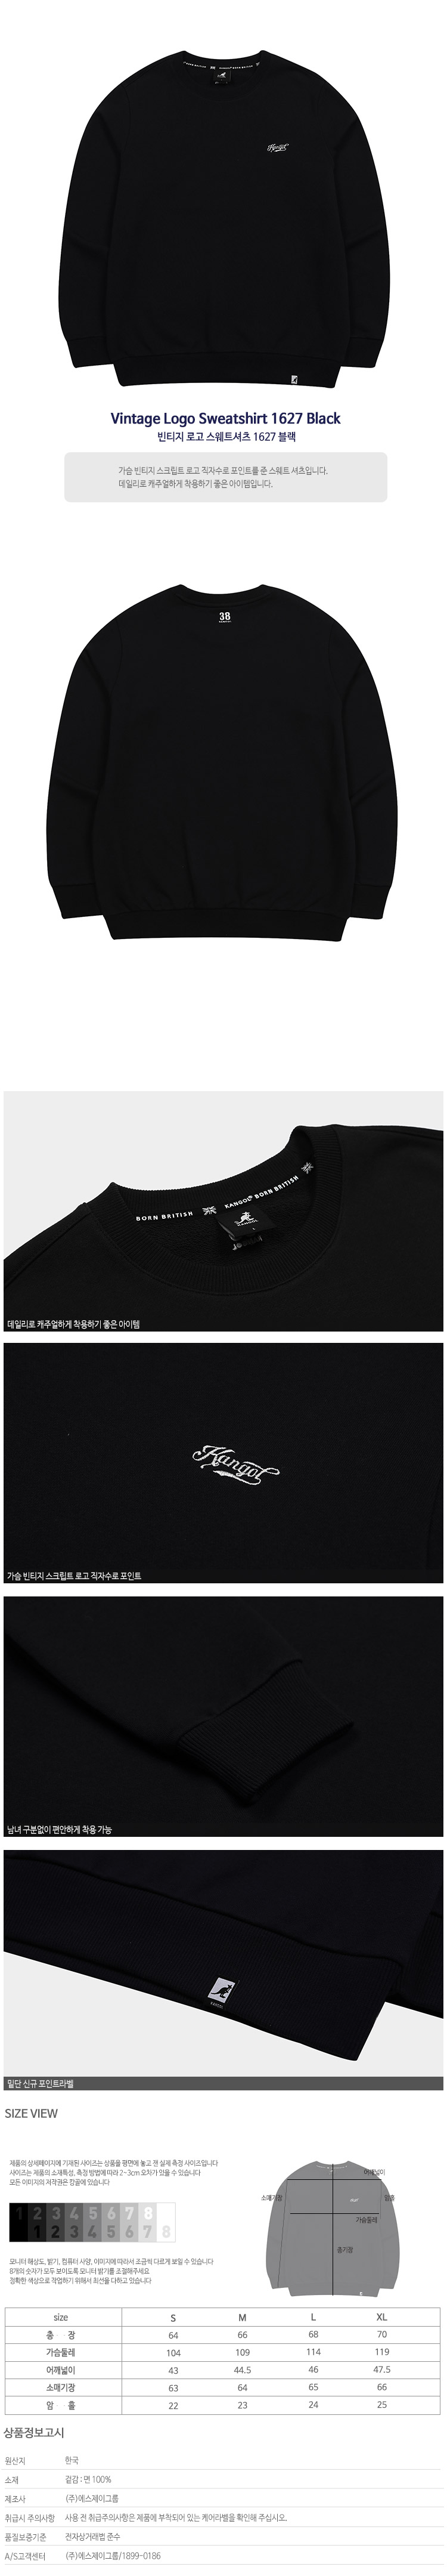 Vintage Logo Sweatshirt 1627 BLACK